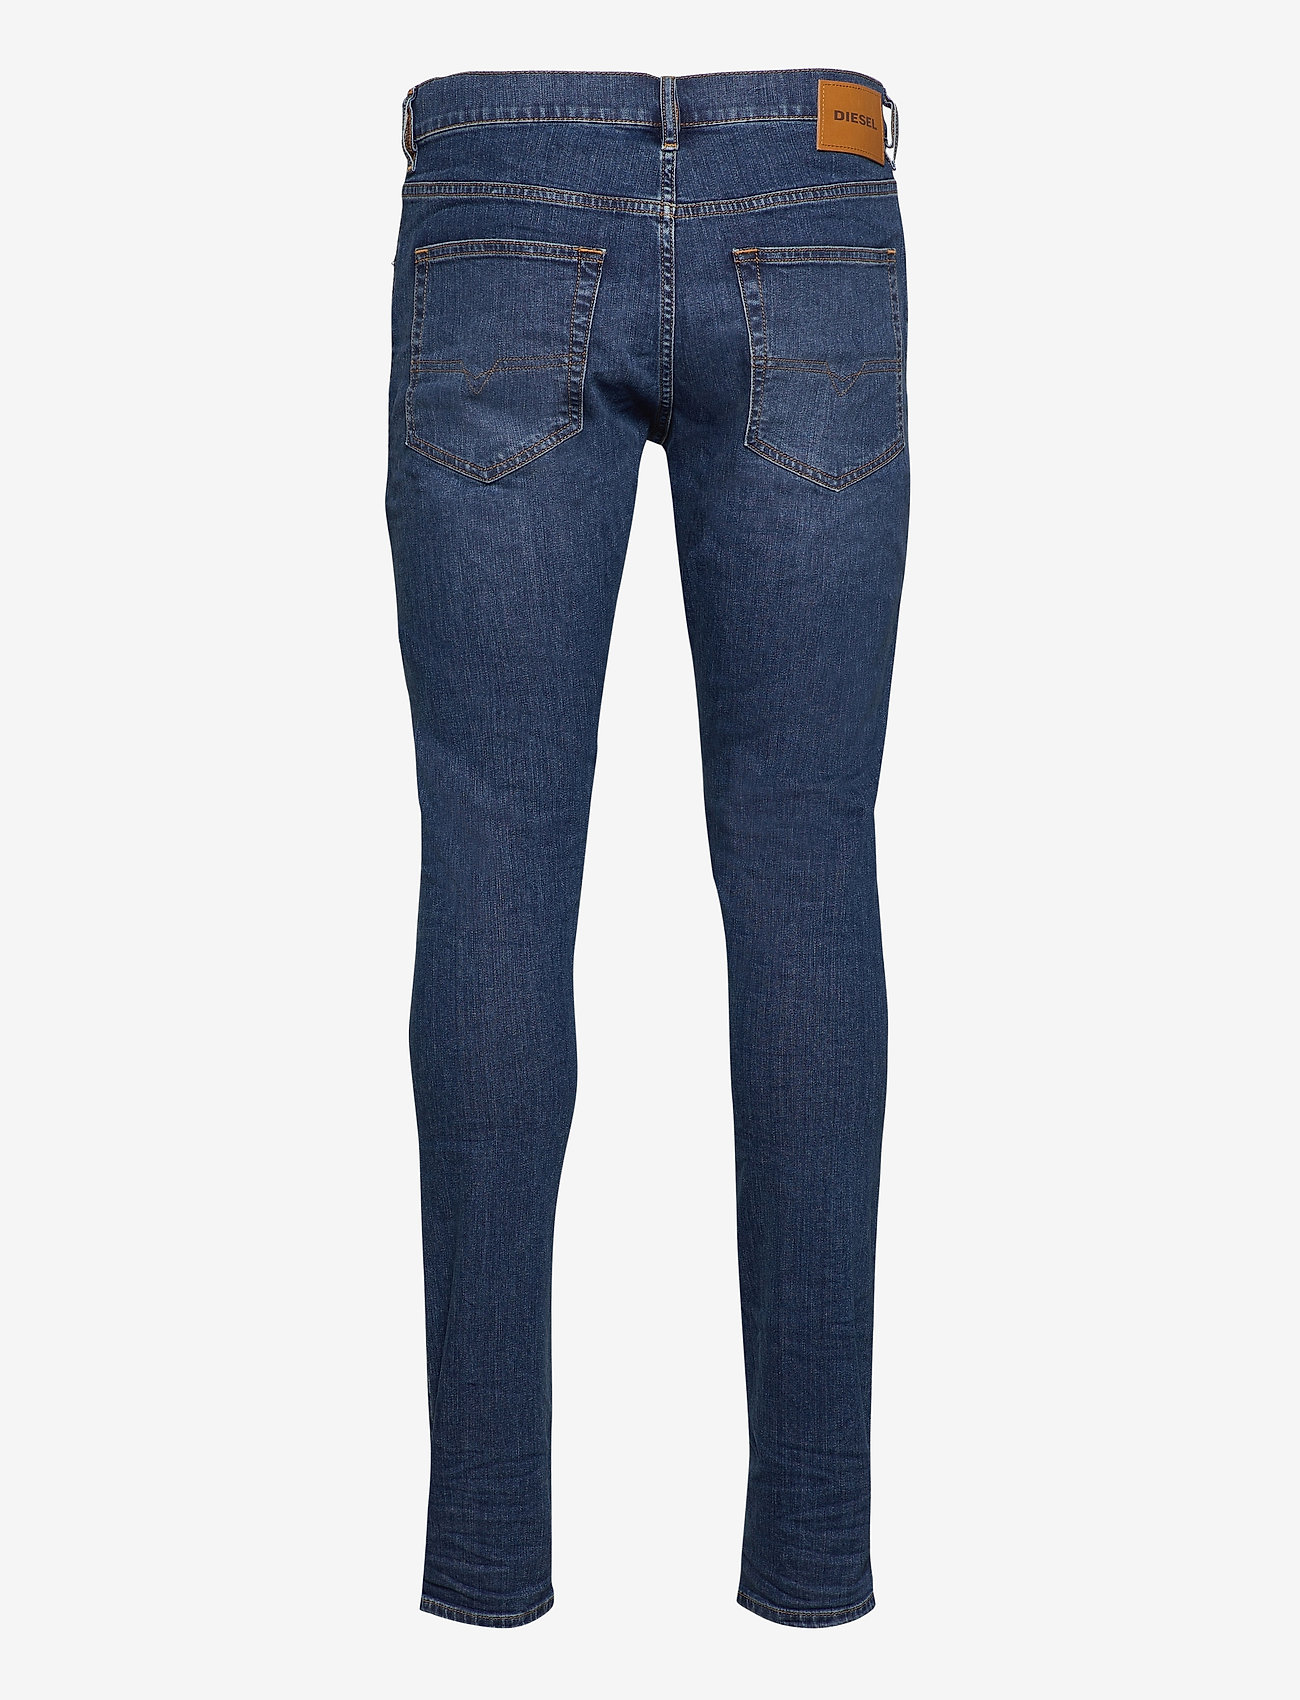 Diesel Men - D-LUSTER L.34 TROUSERS - slim jeans - denim - 1